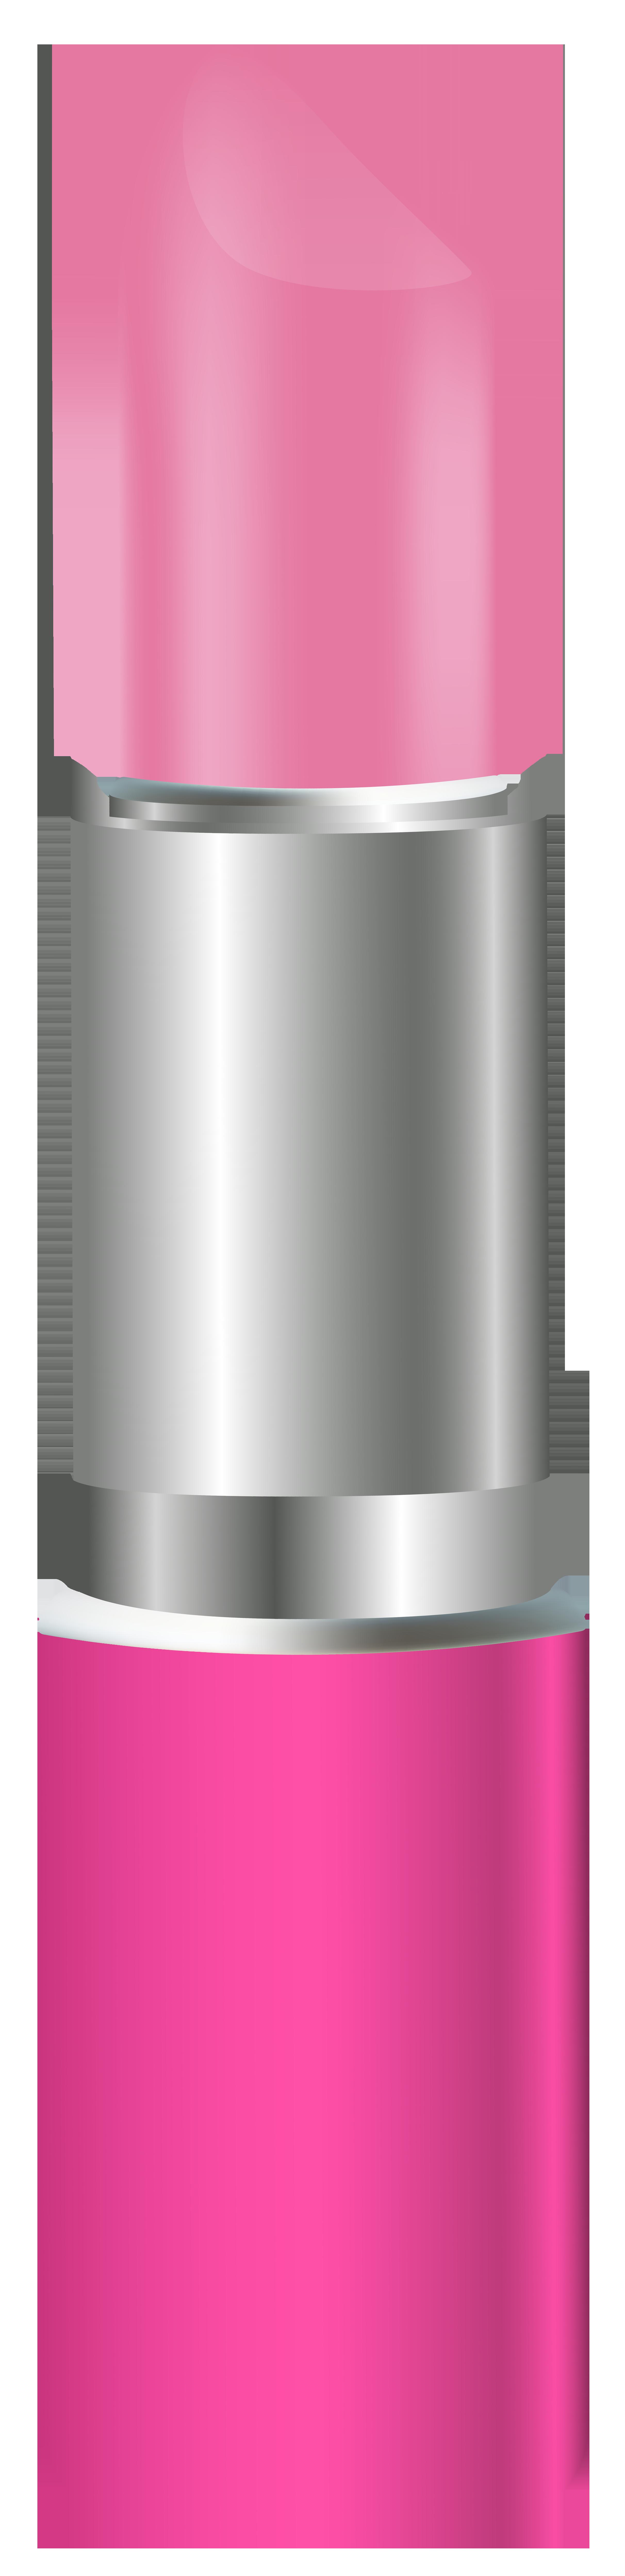 Lipstick clipart. Transparent png clip art